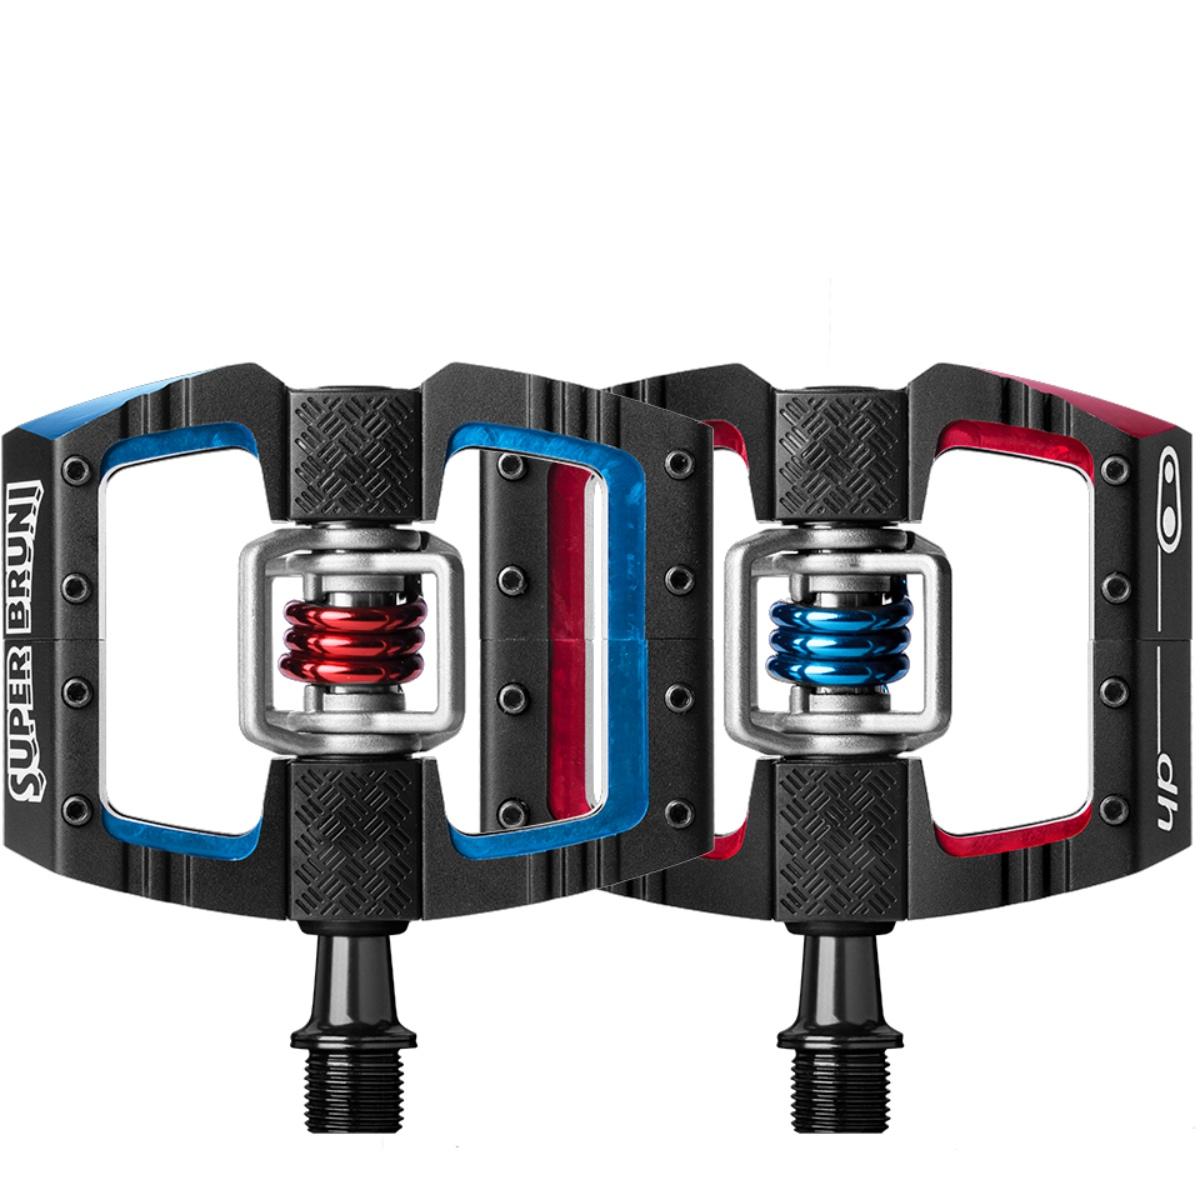 Crankbrother Mallet DH SuperBruni Pedals